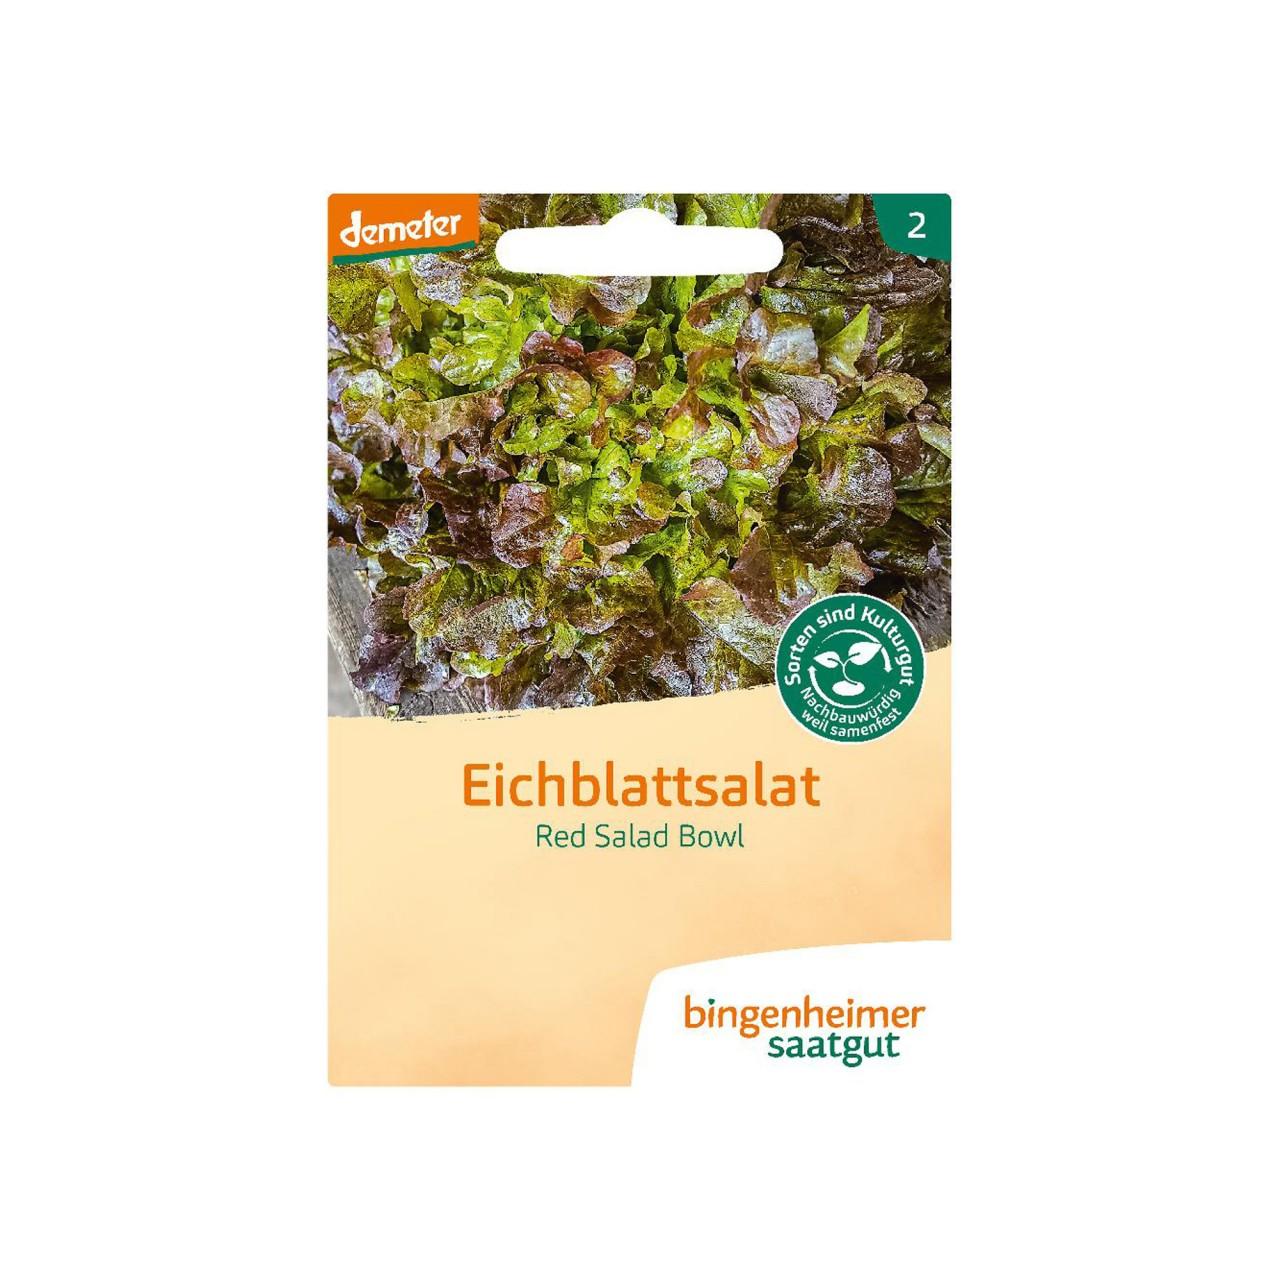 Eichblattsalat Red Salad Bowl - Bio-Saatgut